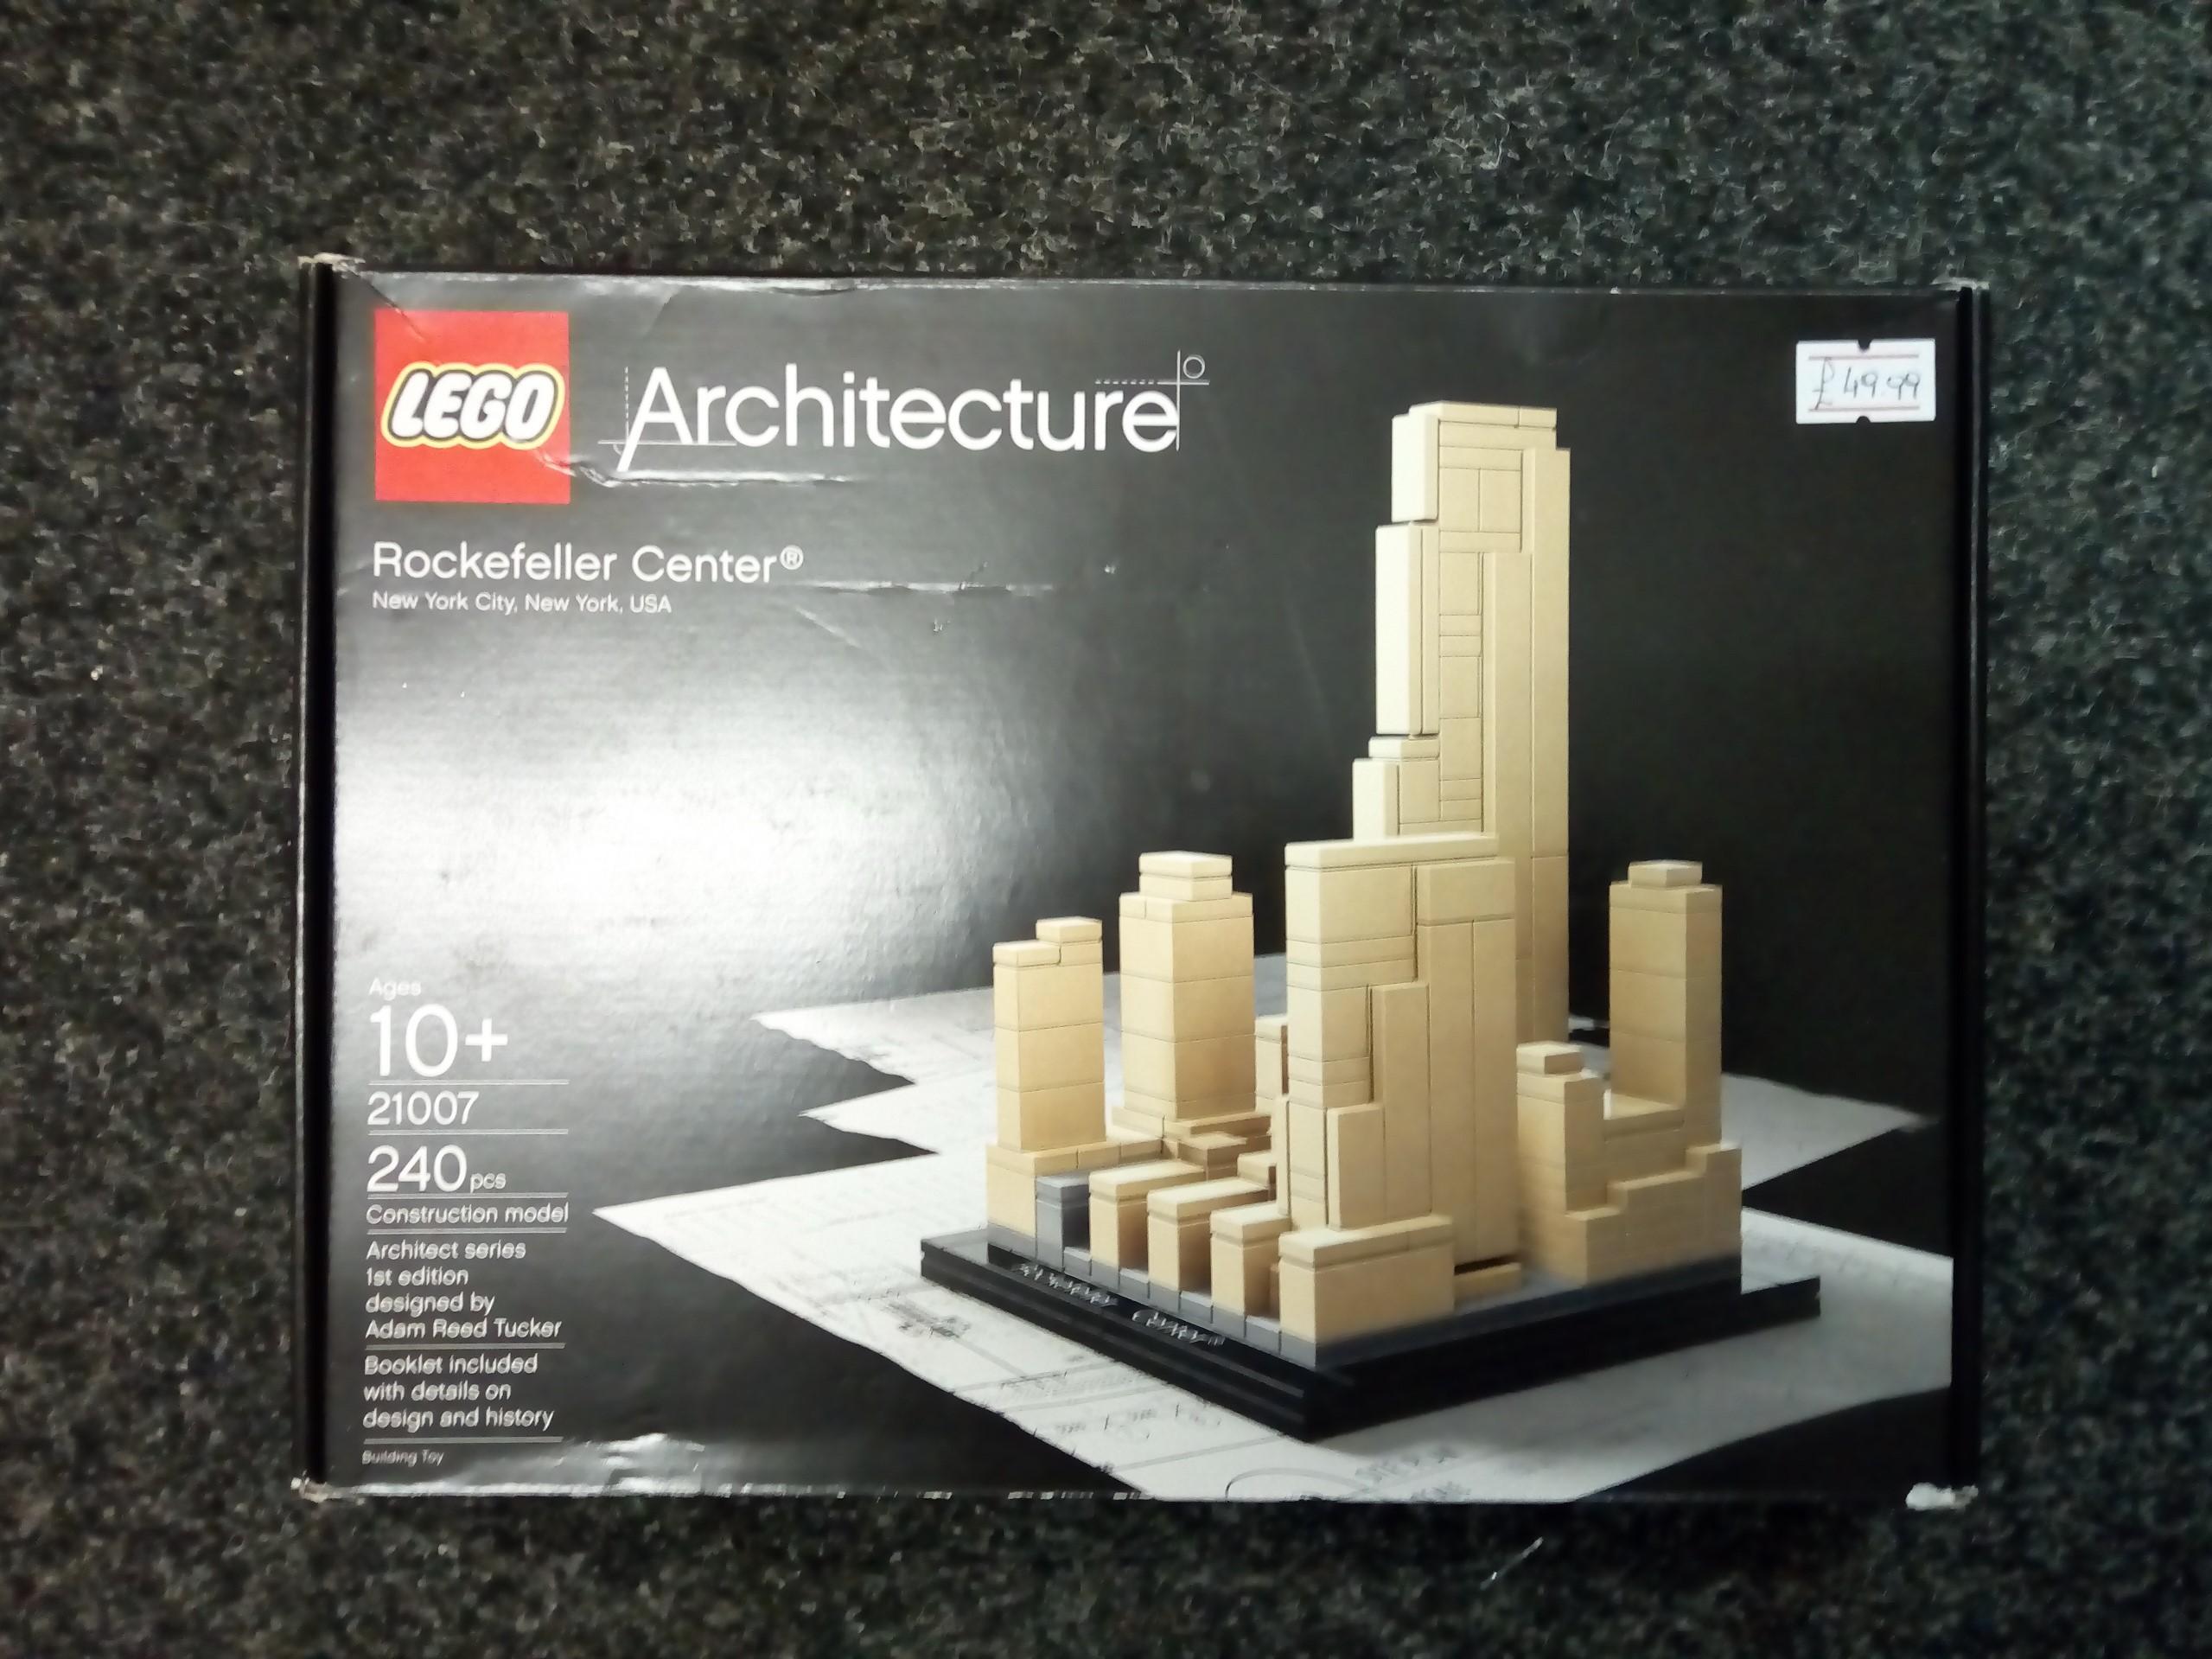 Lego 21007 Rockefeller Center